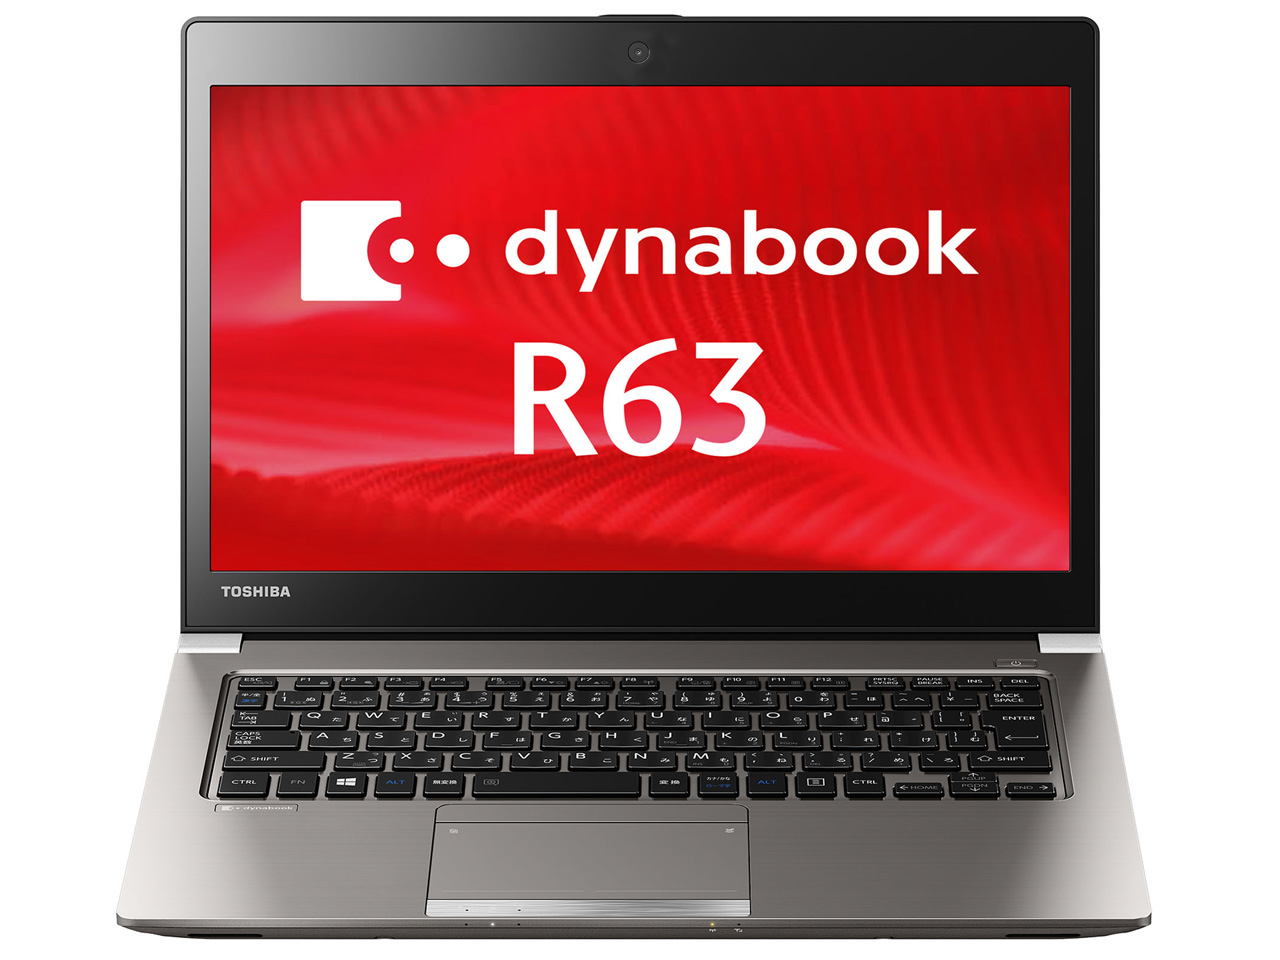 Core i5 5300U 2.3GHz 4GB SSD:128GB Win10 Pro 64bit 商品ランク:B 中古ノートパソコンCore 往復送料無料 中古 P dynabook PR63PBAA647AD8X TOSHIBA 無償保証6ヶ月 セール特別価格 中古ノートパソコンTOSHIBA 動作ランク:A R63